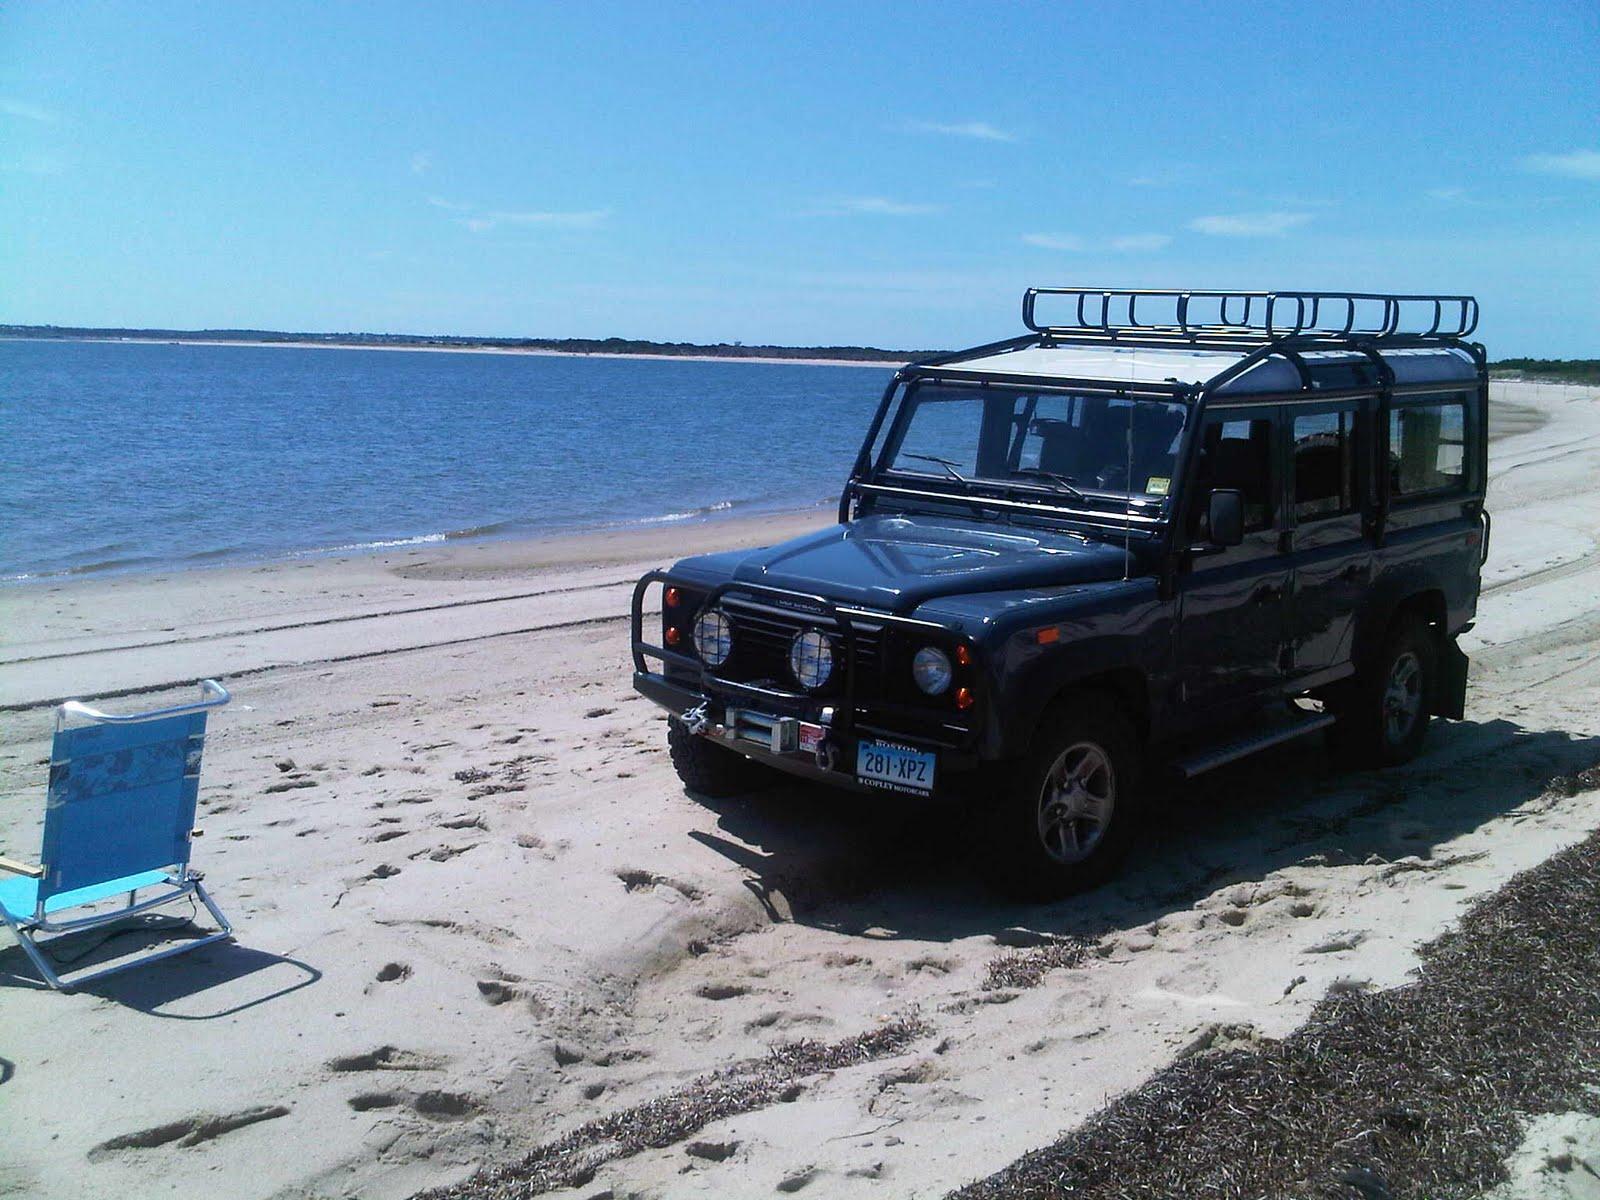 Craigslist Fort Walton Beach >> Preppy Handbook Take Notice: The Nantucket Beach Cars ...